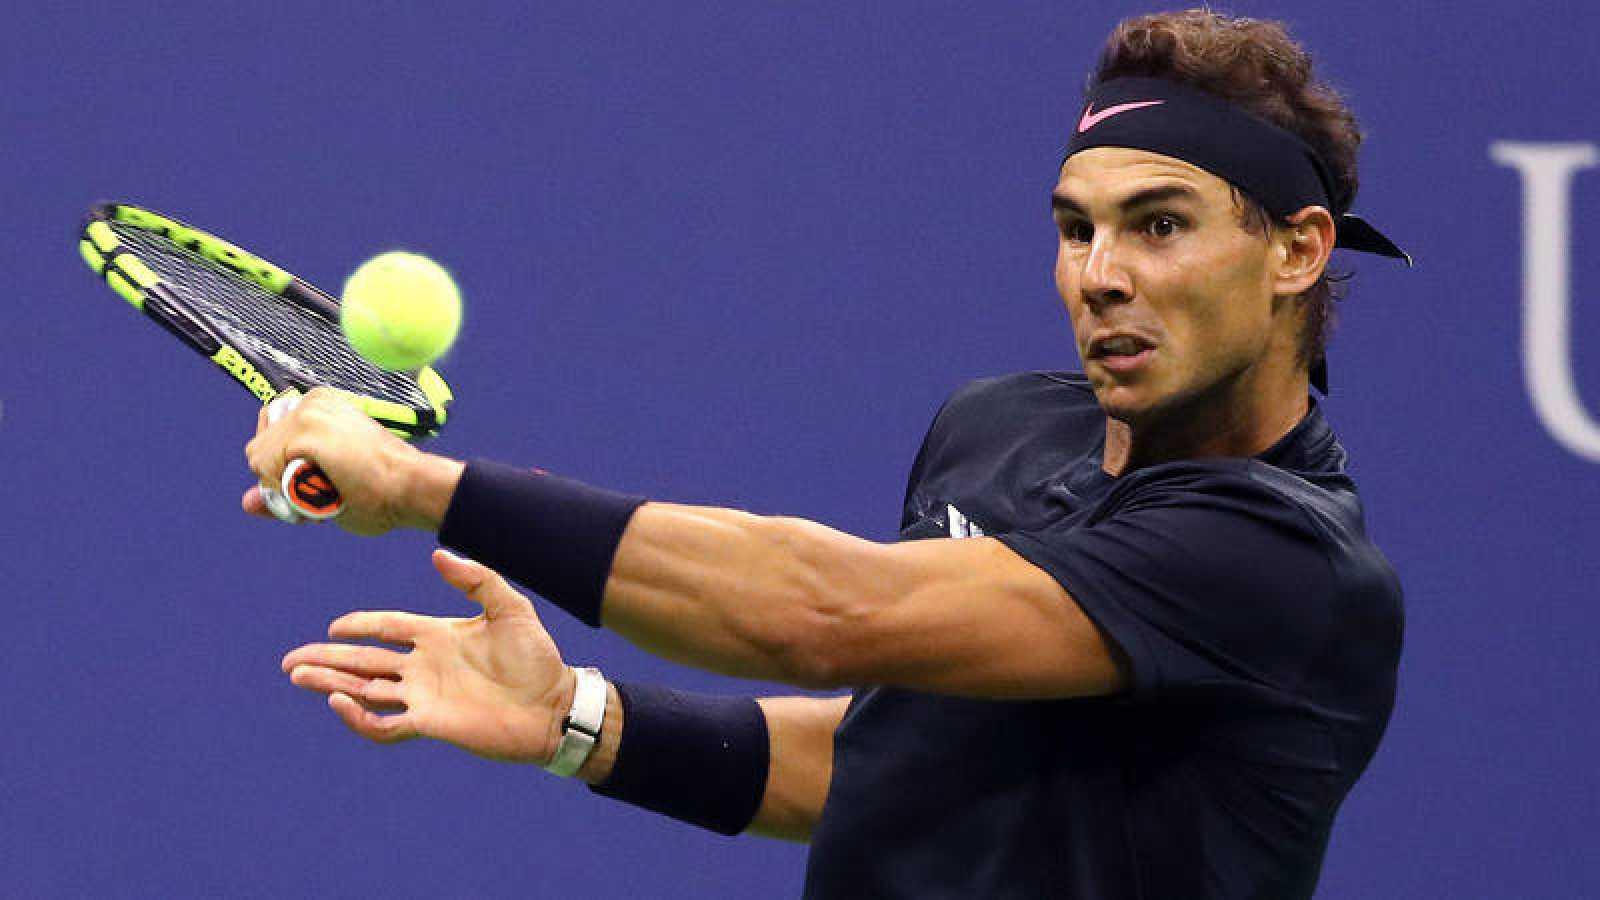 Rafa Nadal, favorito para conseguir su tercer US Open.